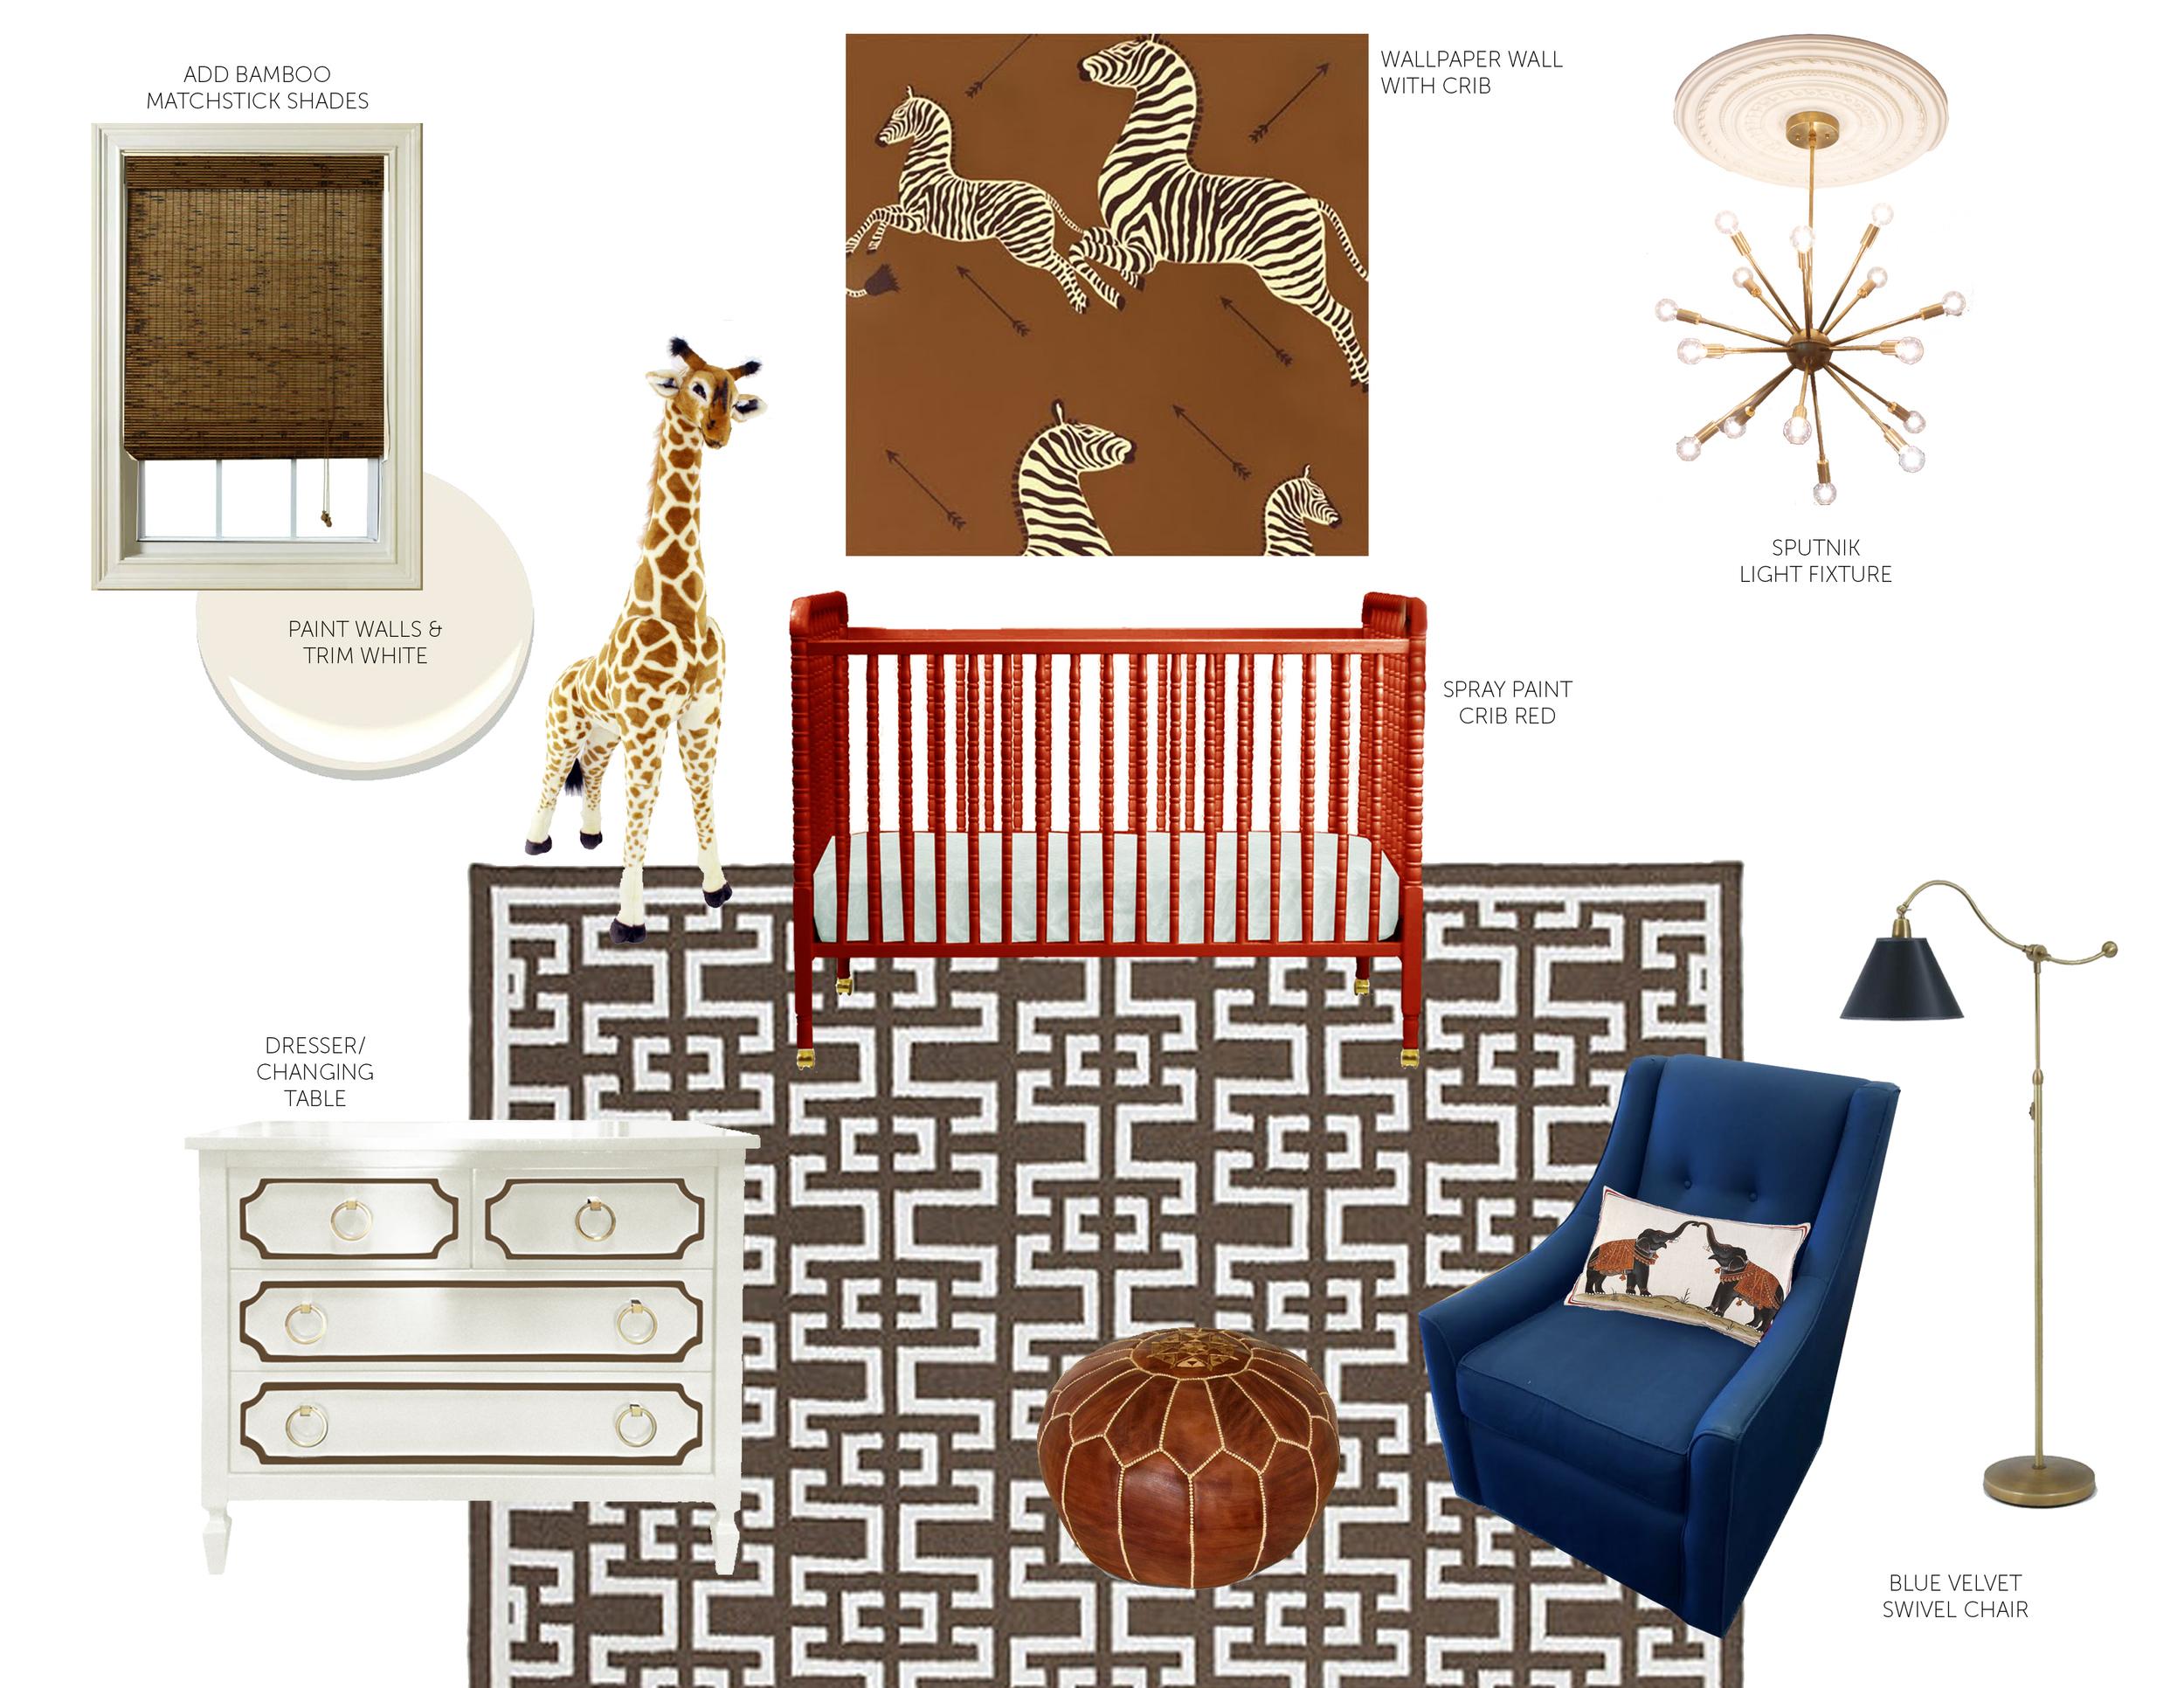 L I N K S :  light fixtue     dresser/changing table     rug     pouf     floor lamp     crib     wallpaper     glider     throw pillow     crib sheet     giraffe